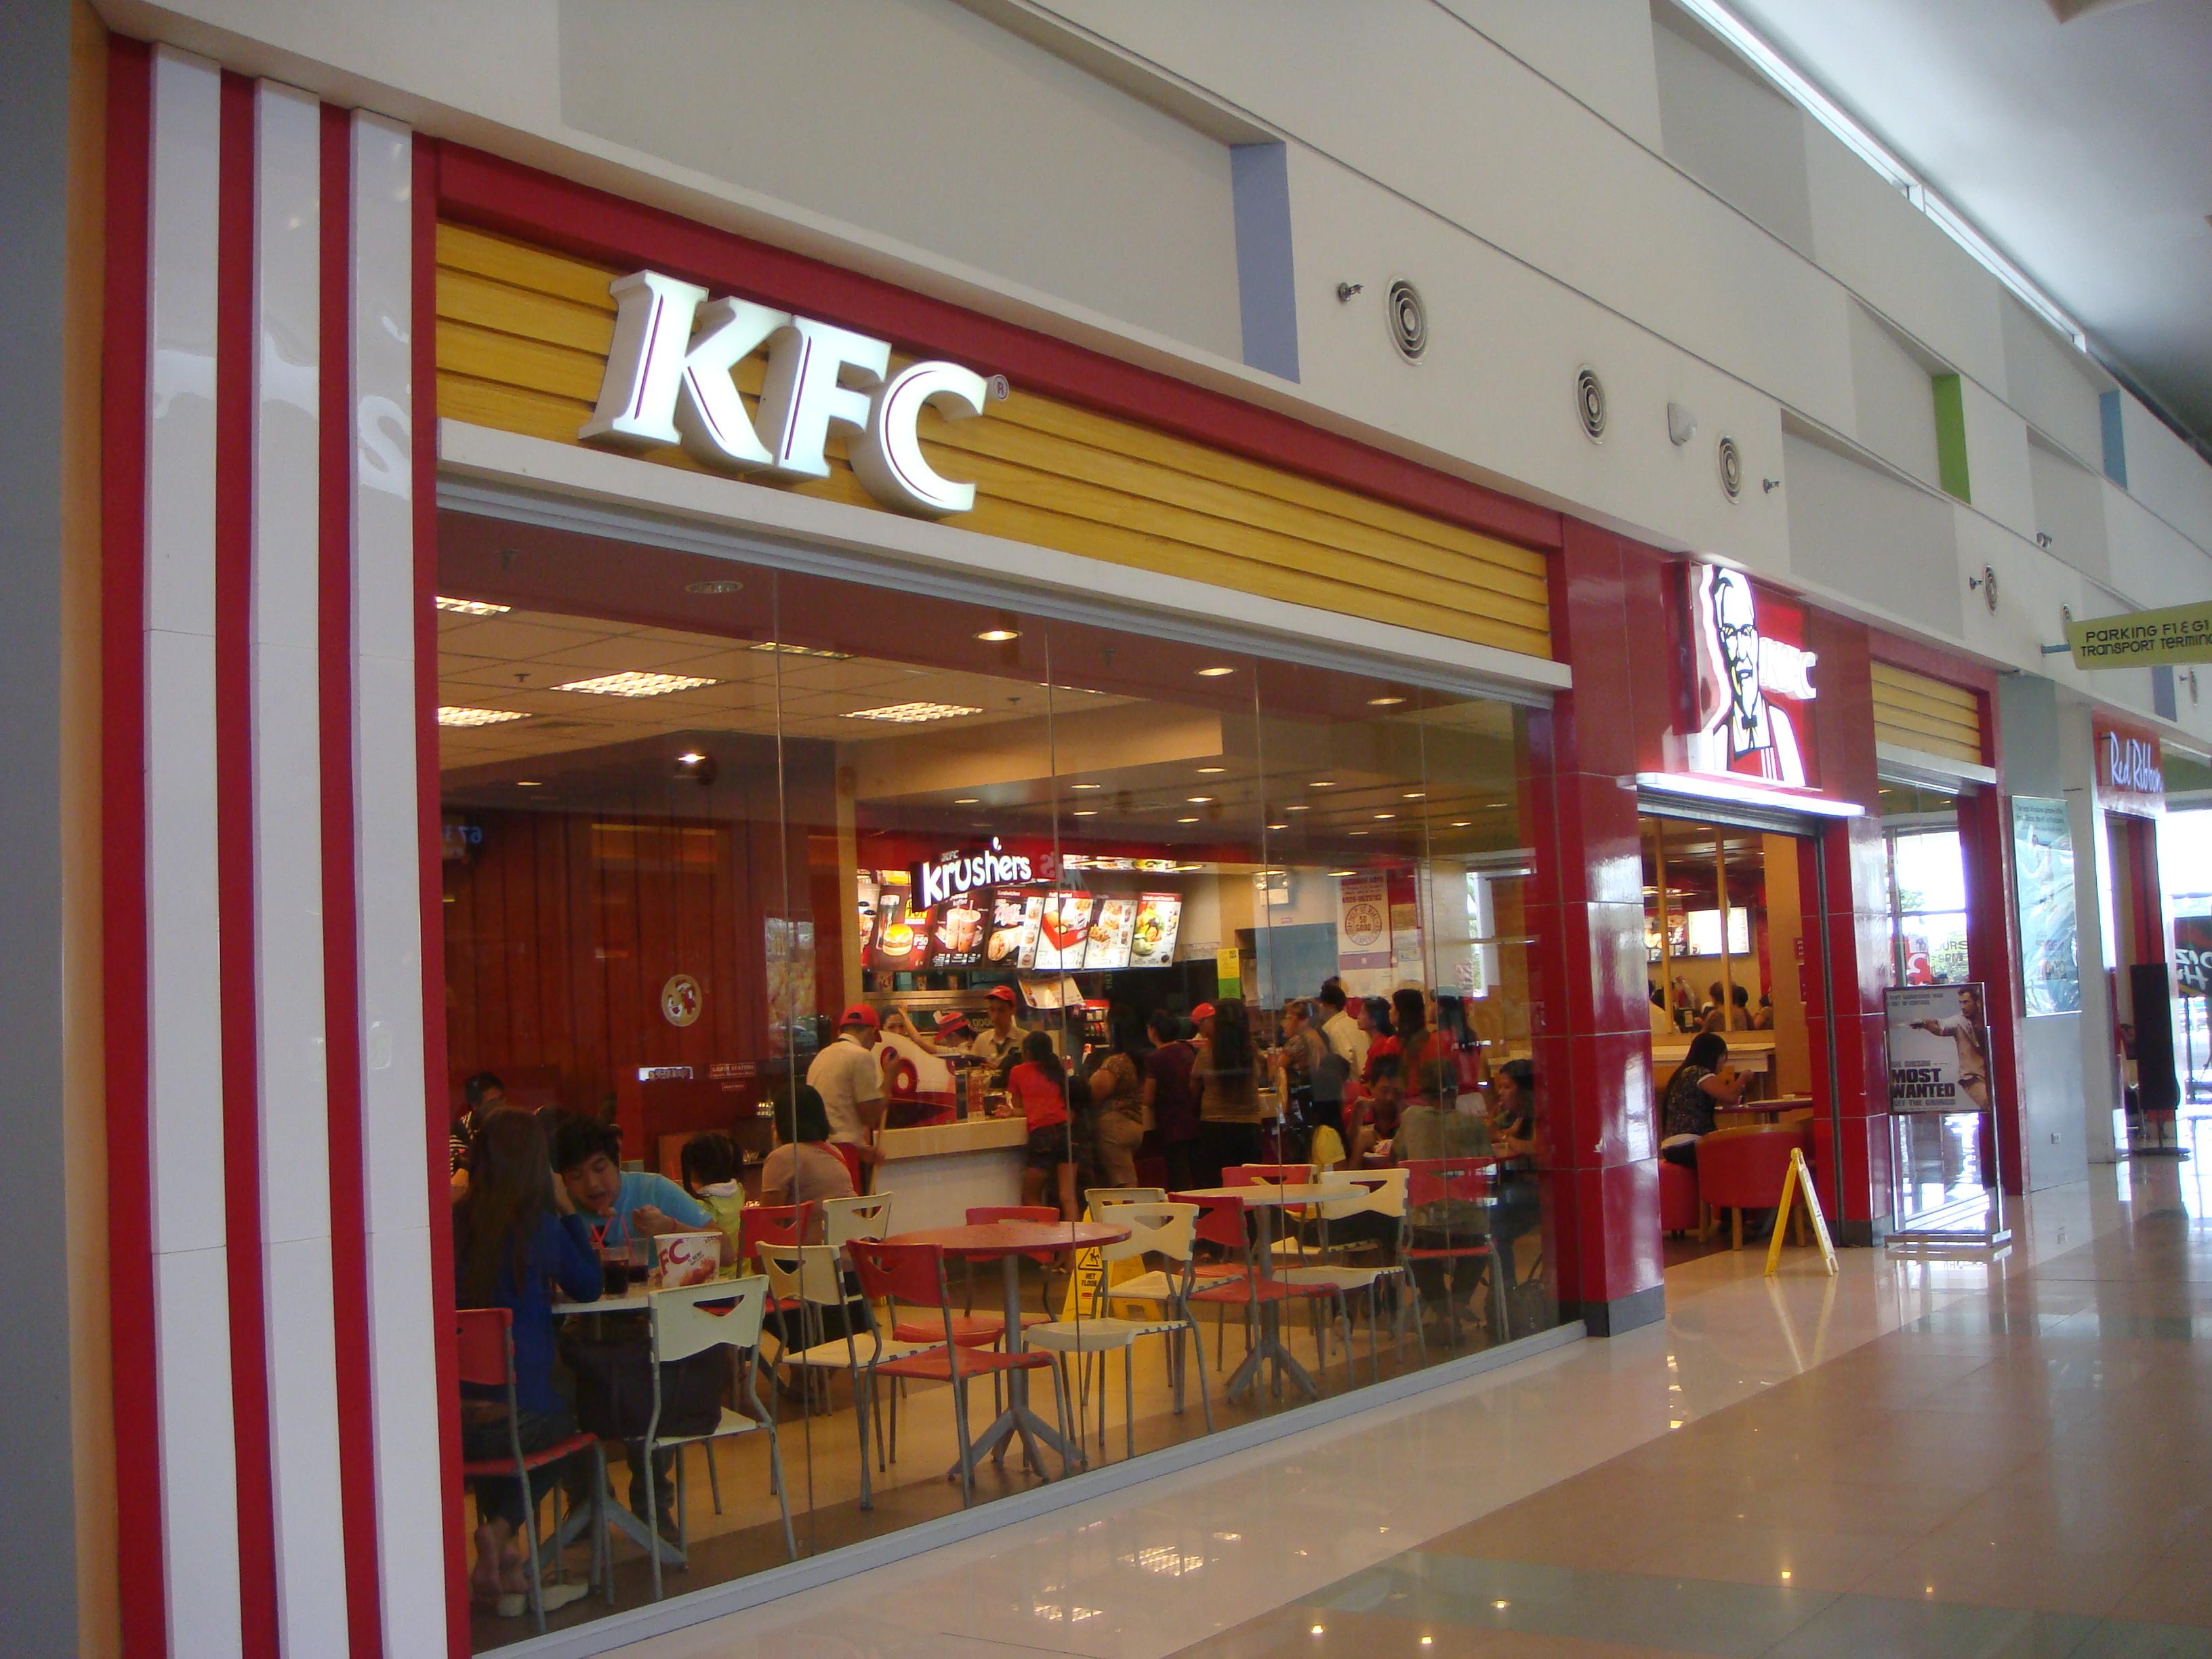 kfc environment